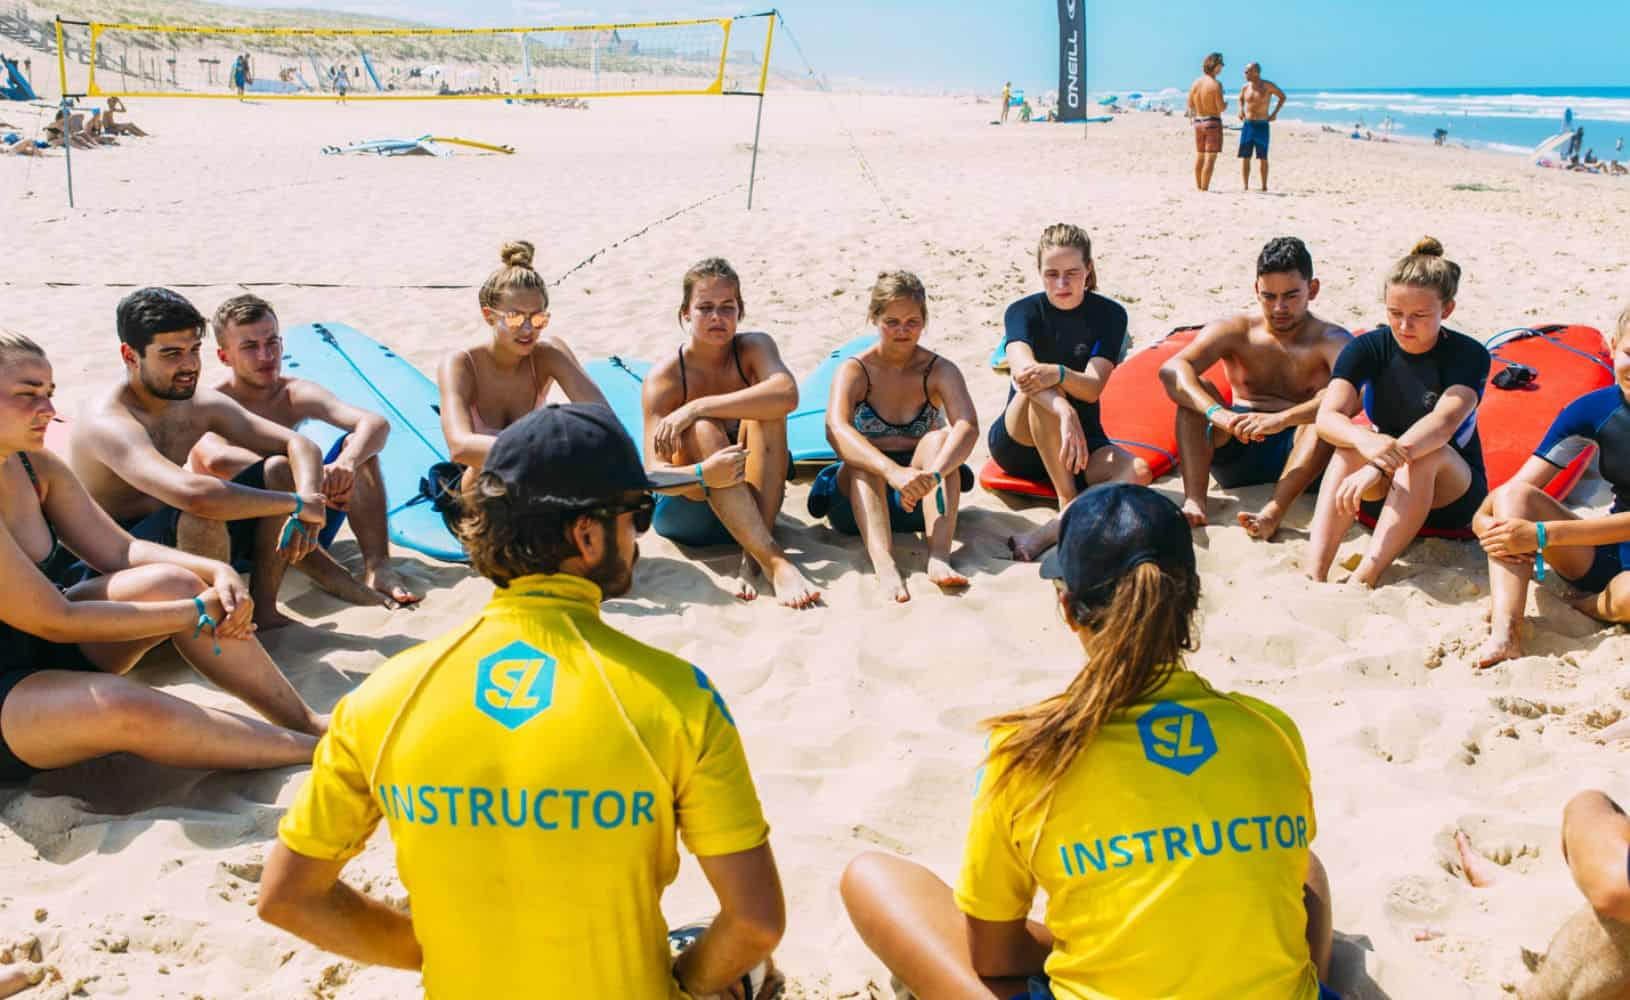 France Surflife O'Neill Surfcamp Mimizan Surf lessons